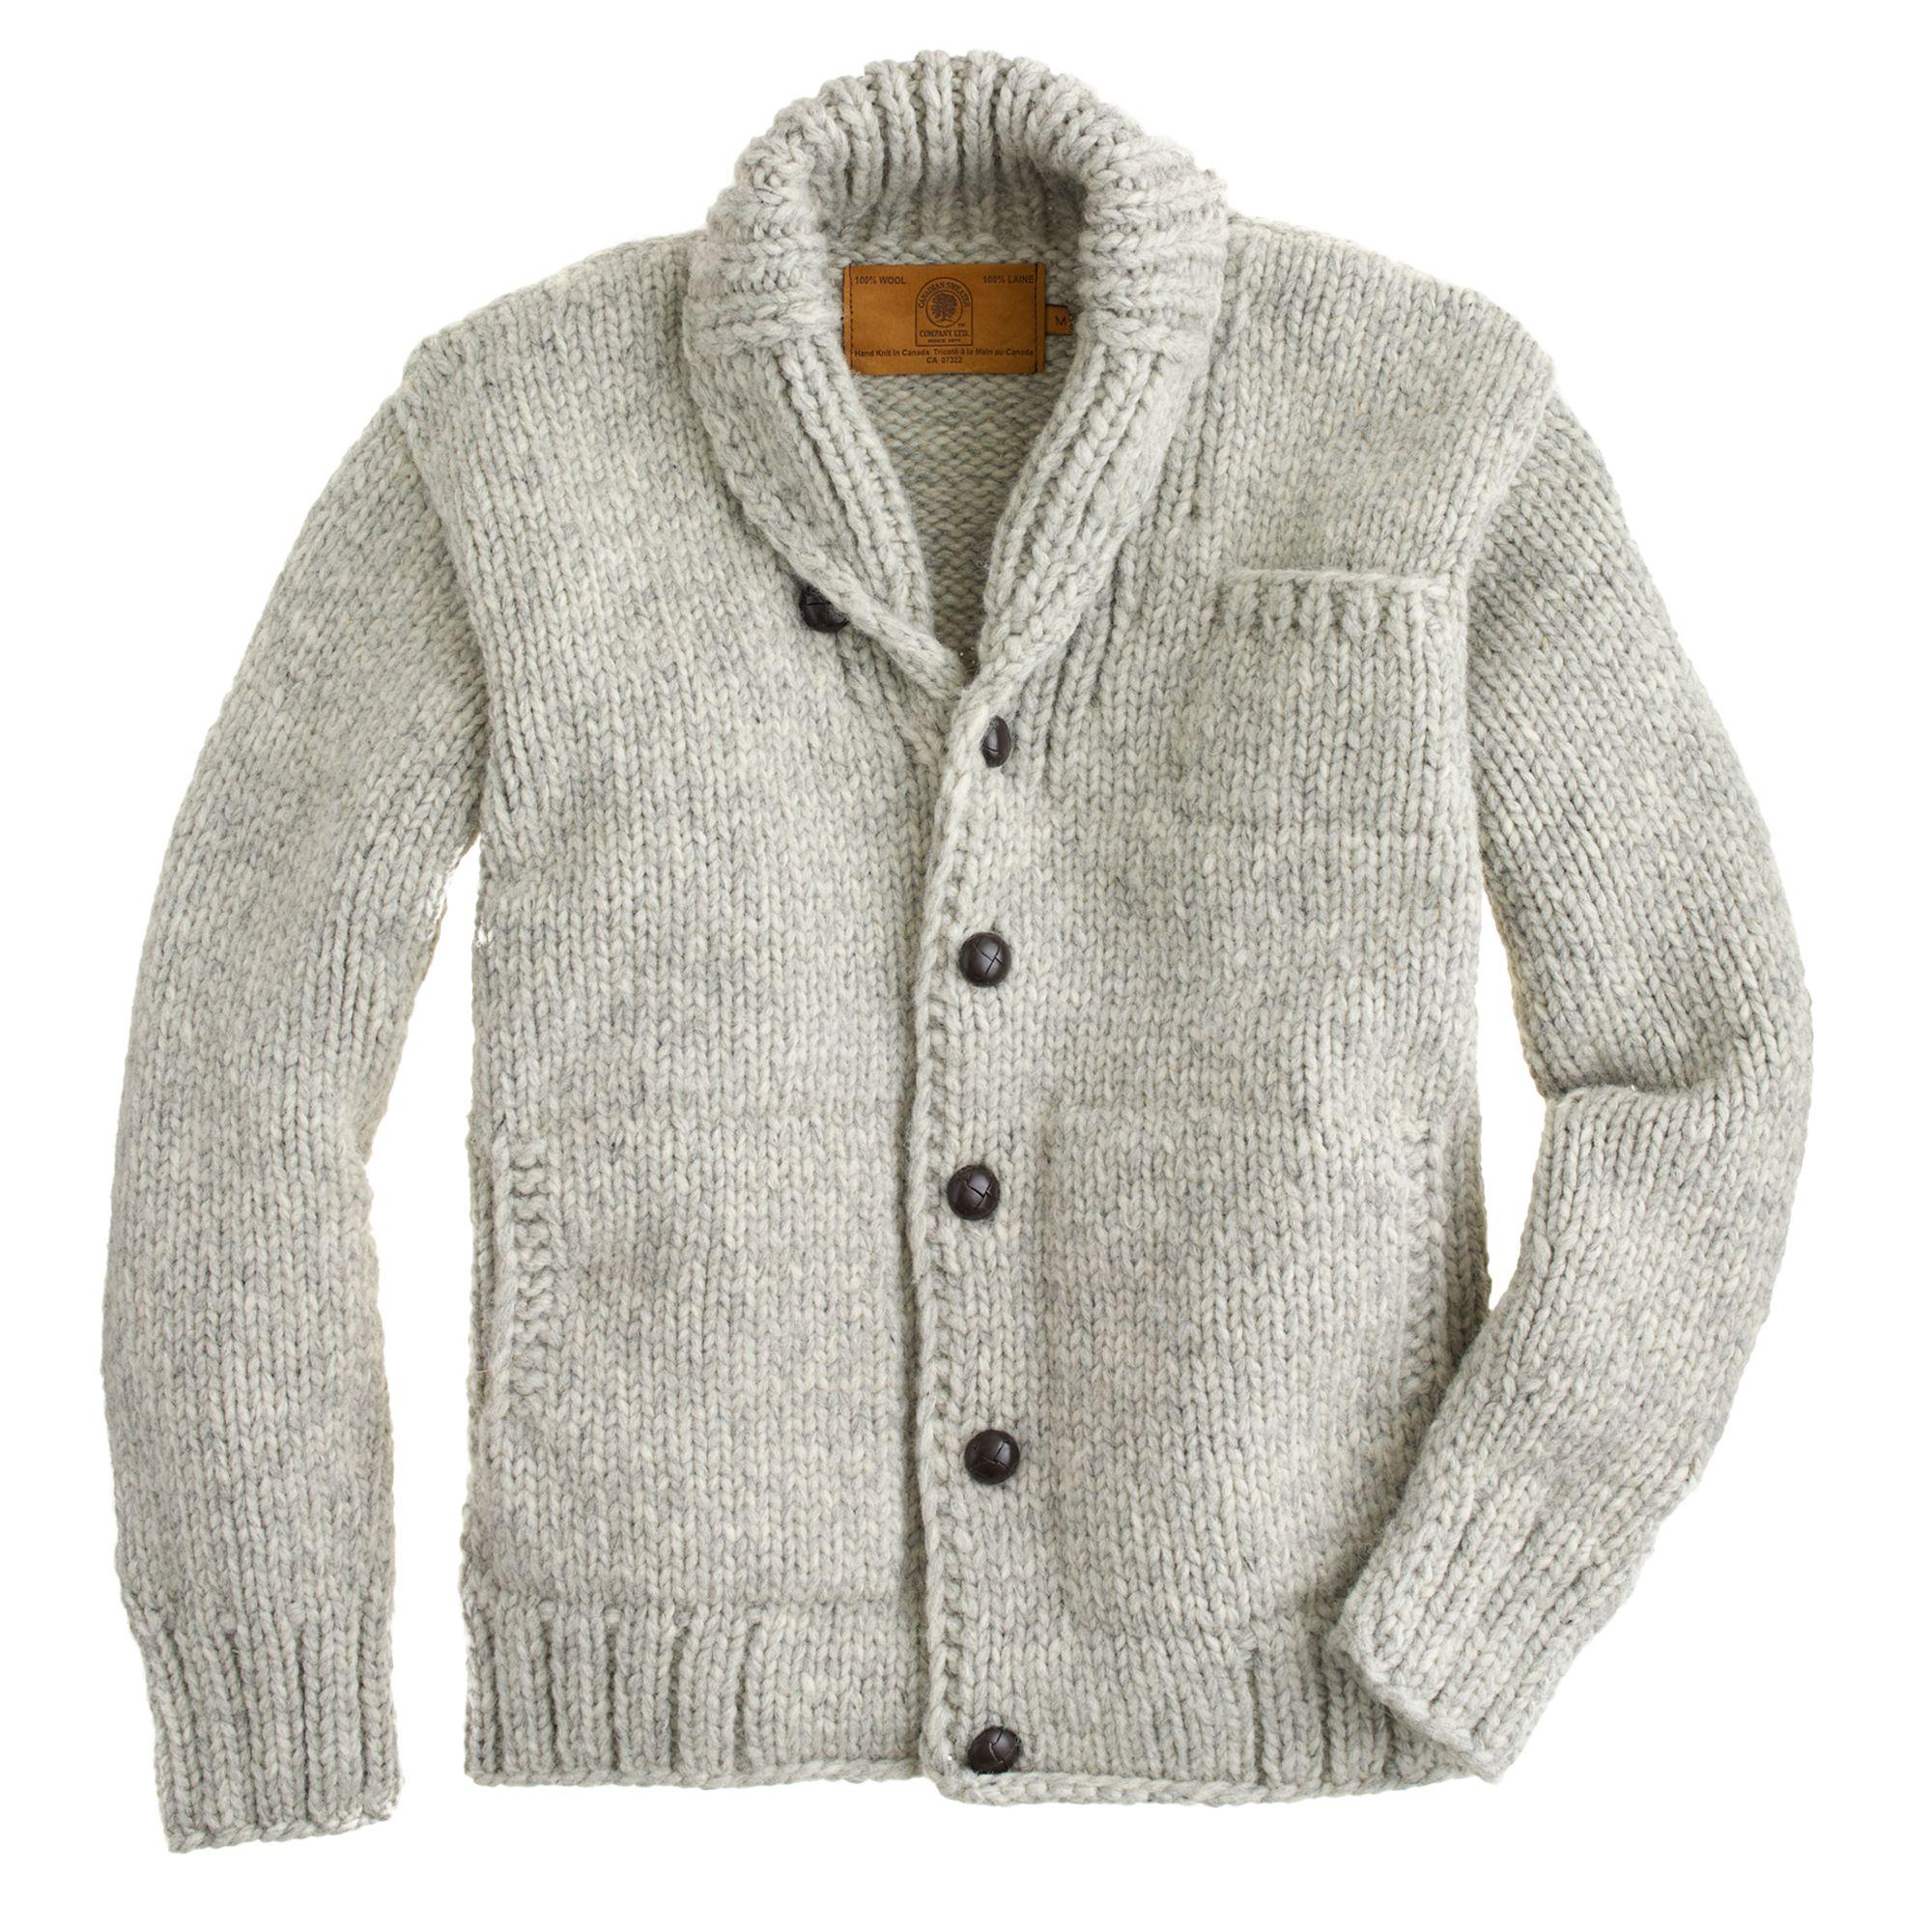 J Crew Canadian Sweater Company Cowichan Cardigan In Grey